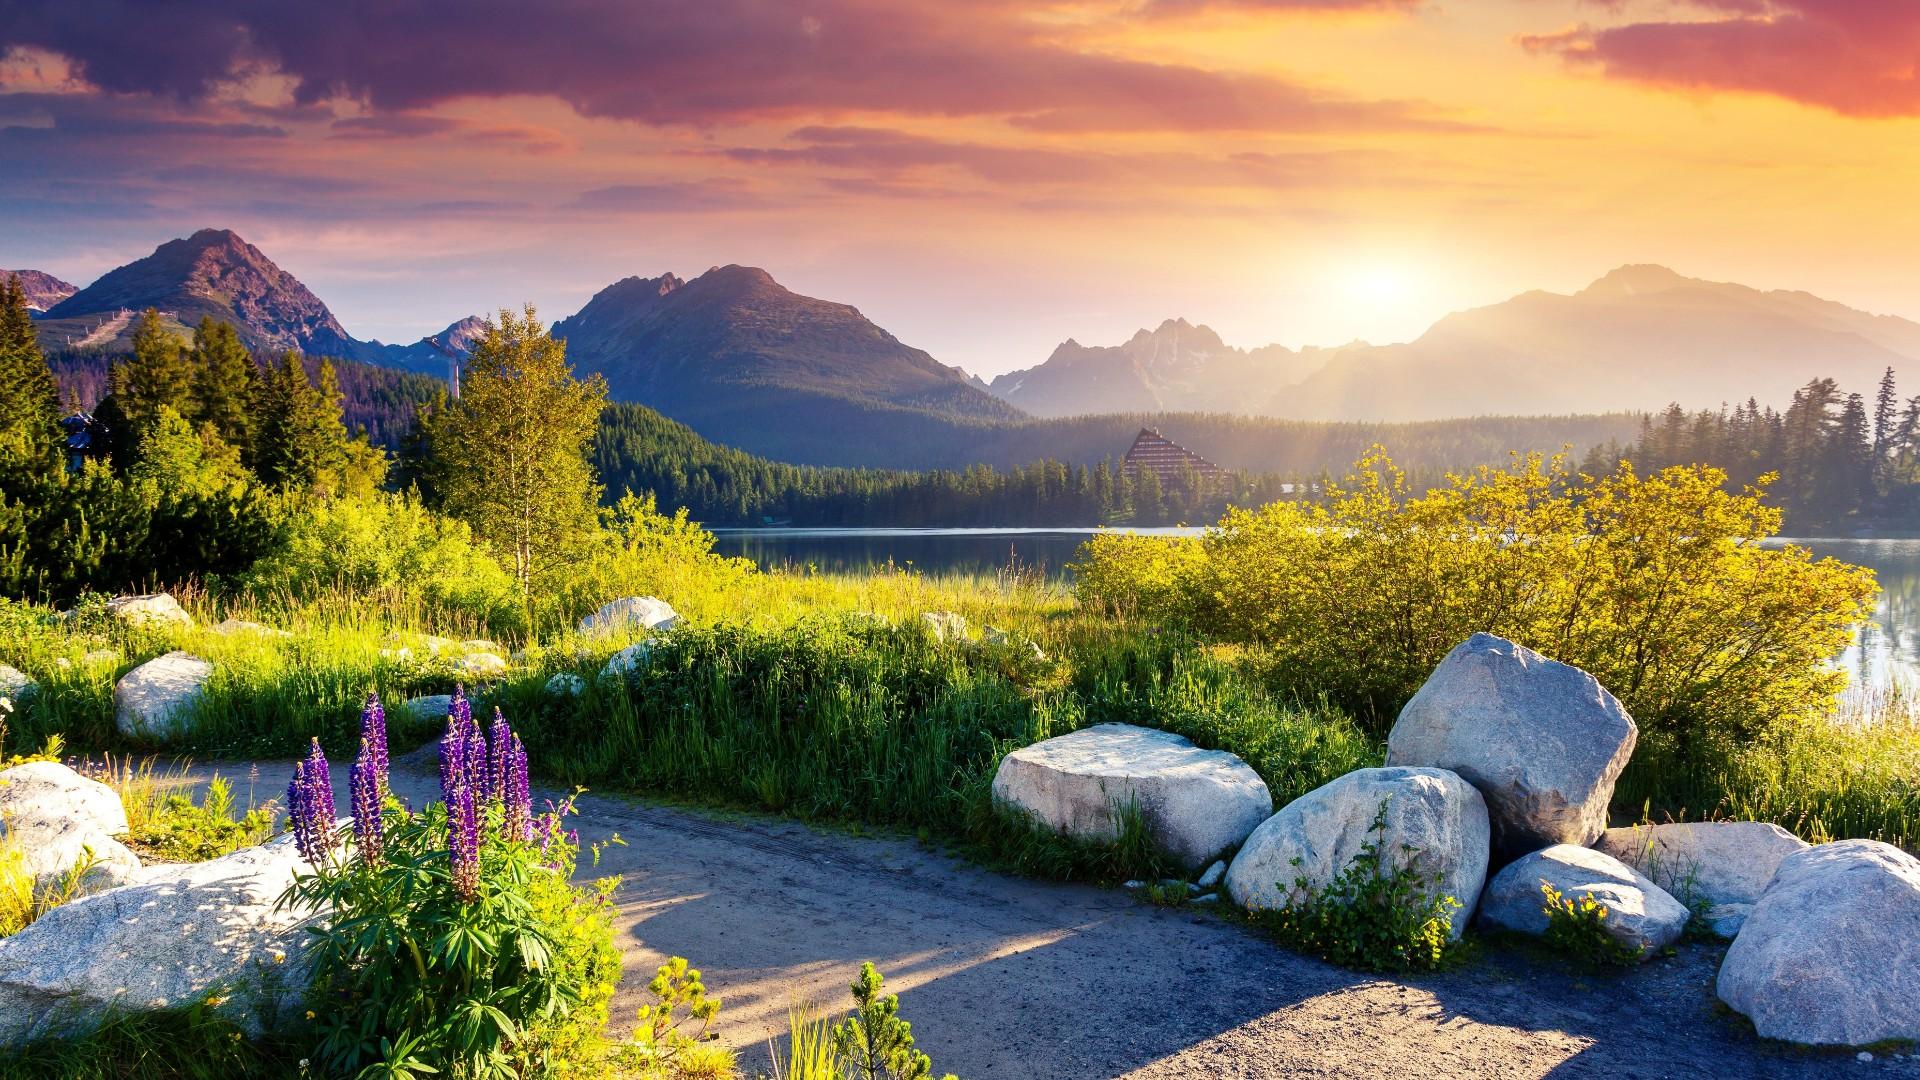 Strbske Pleso Tatra National Park Hd Wallpaper Backiee Free